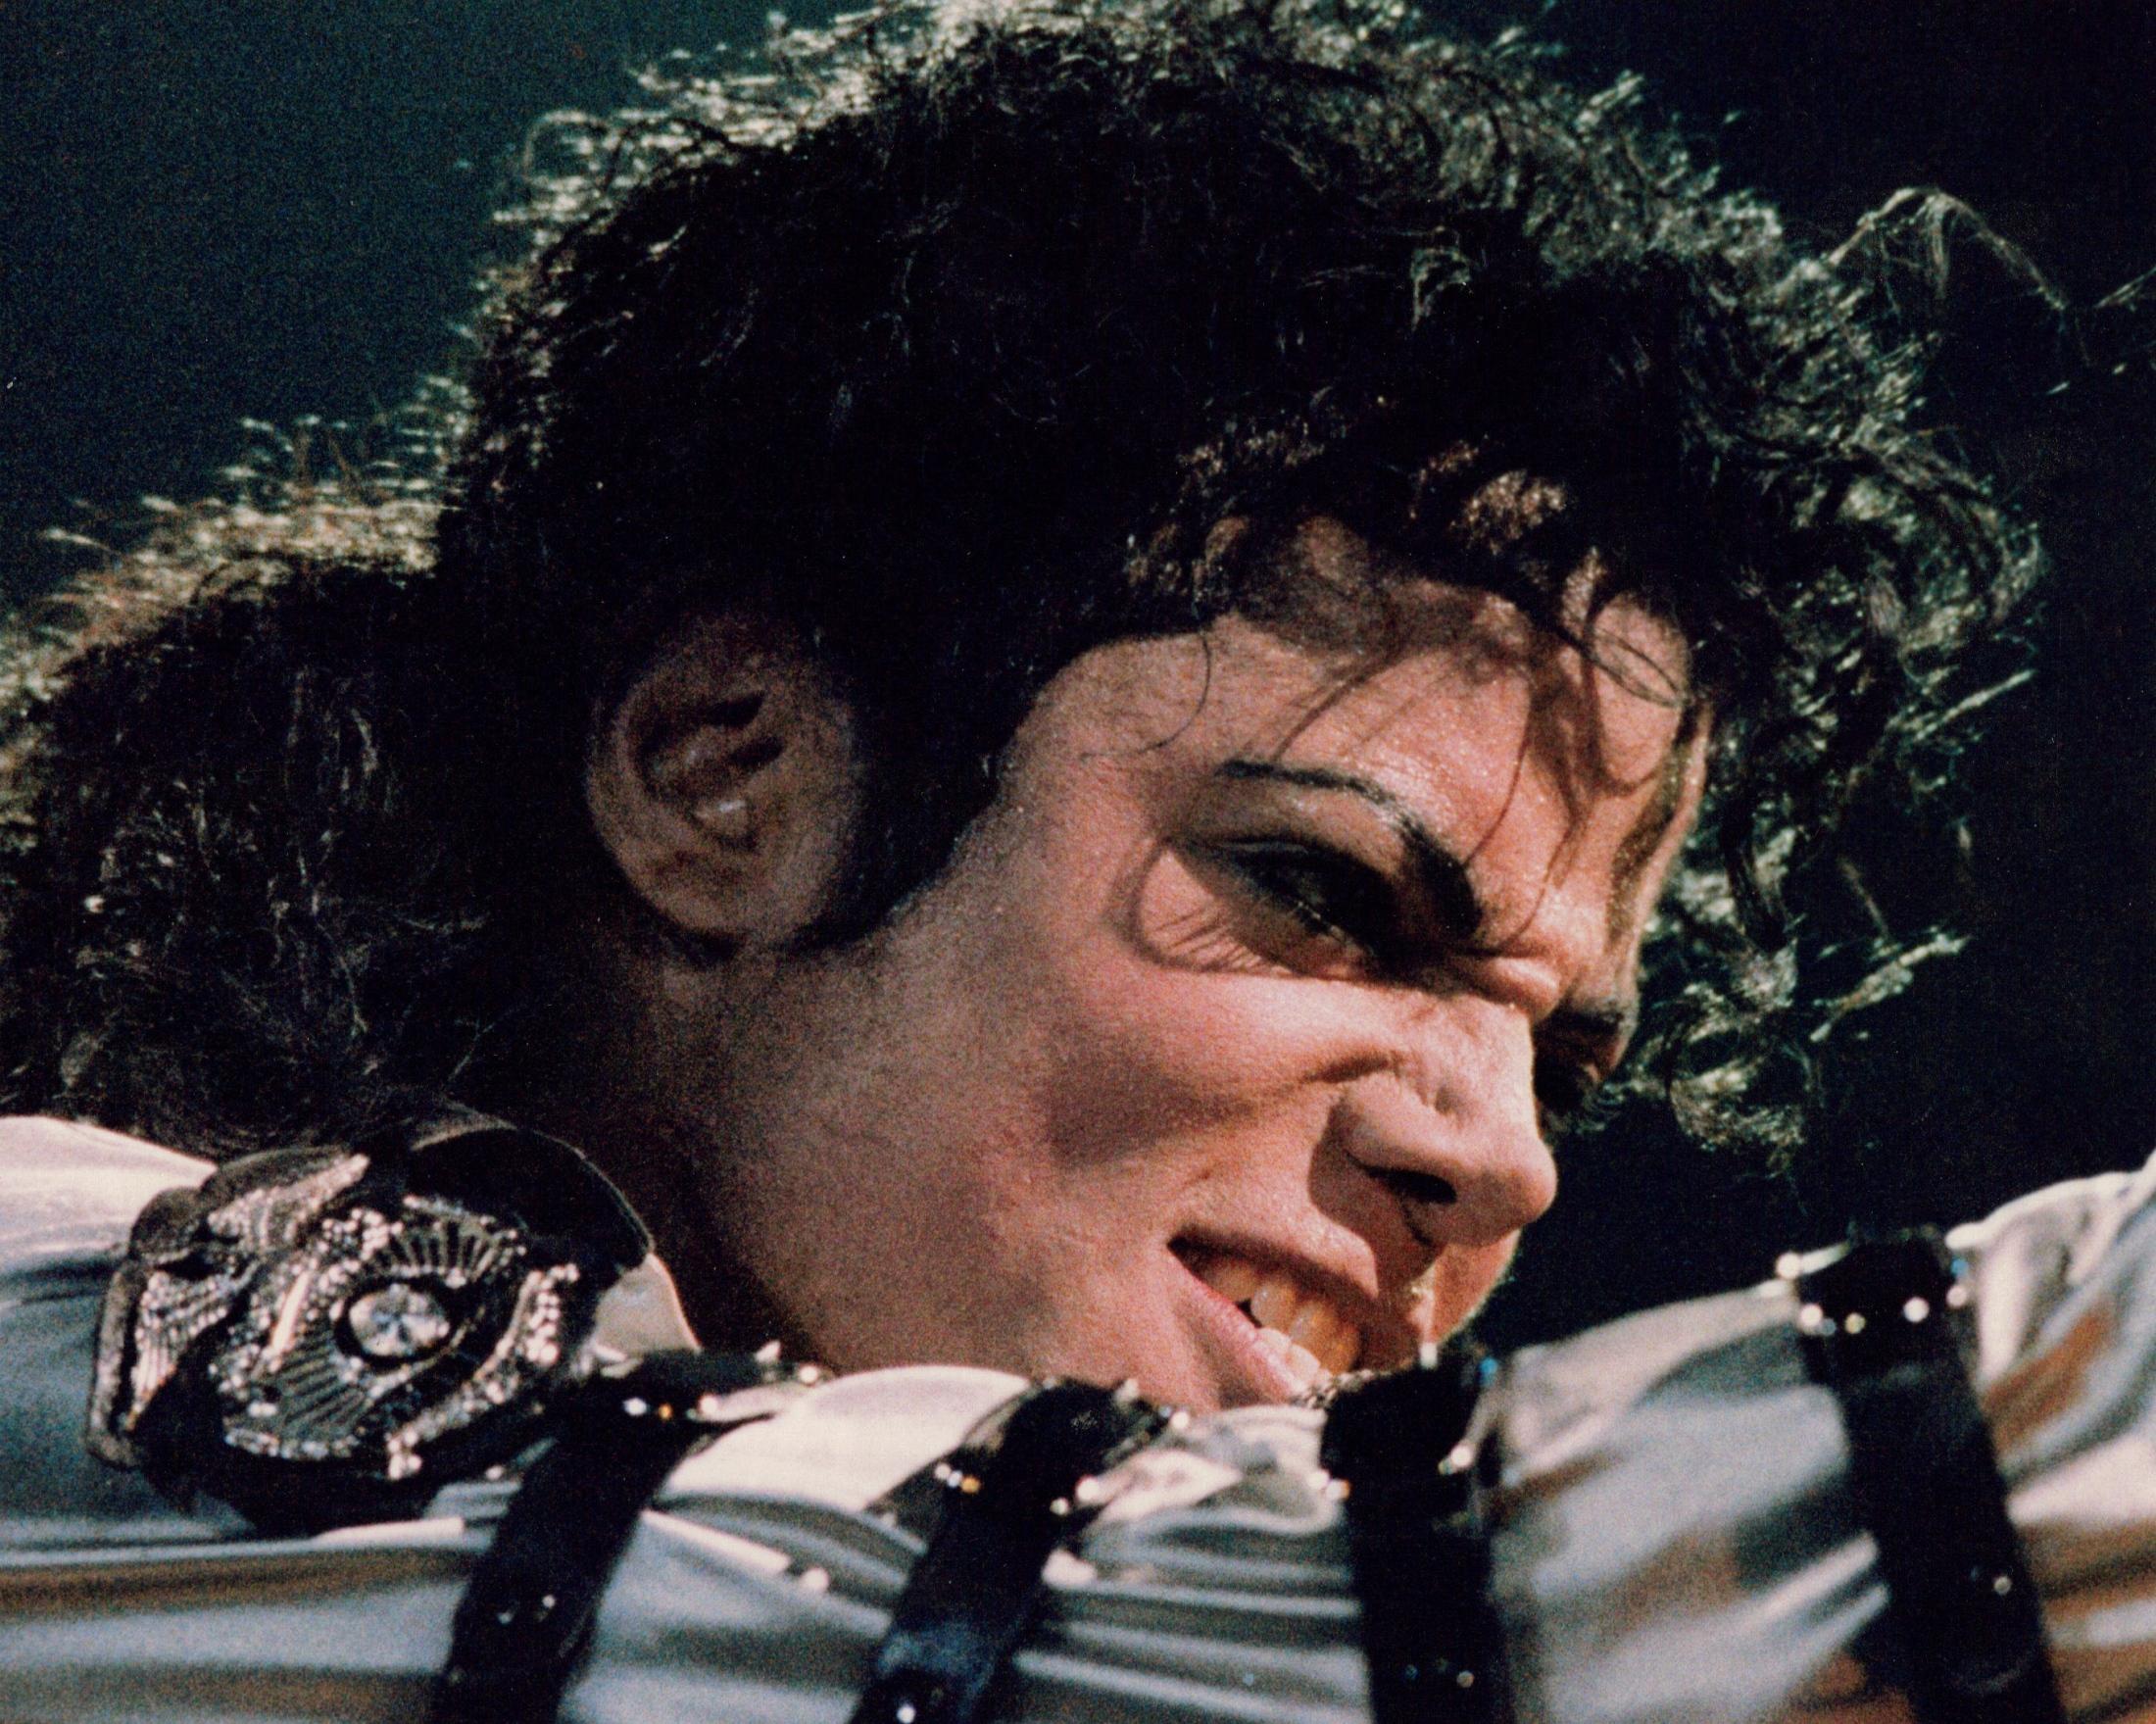 Michael Jackson Bad Tour